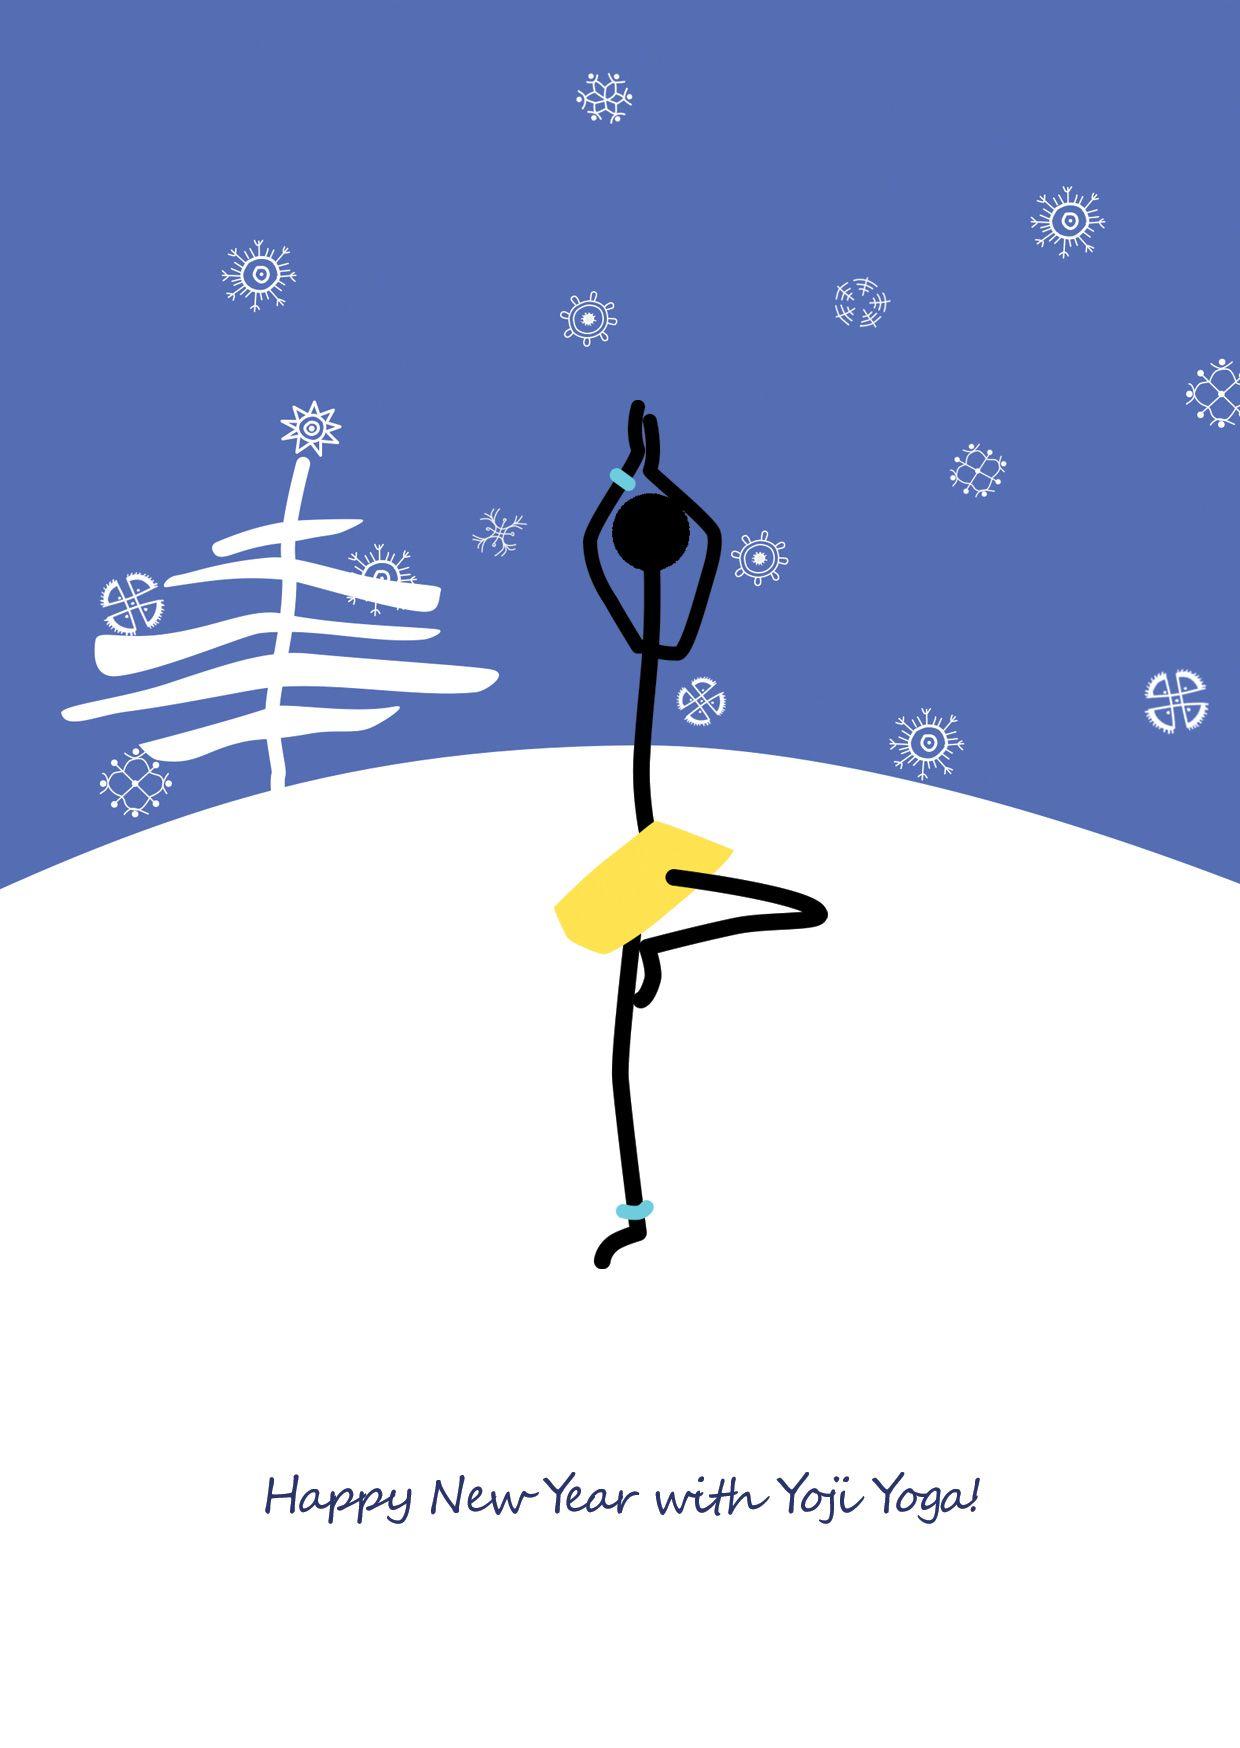 Happy Holidays Chrtistmas Yoga Yoga Christmascard Treepose